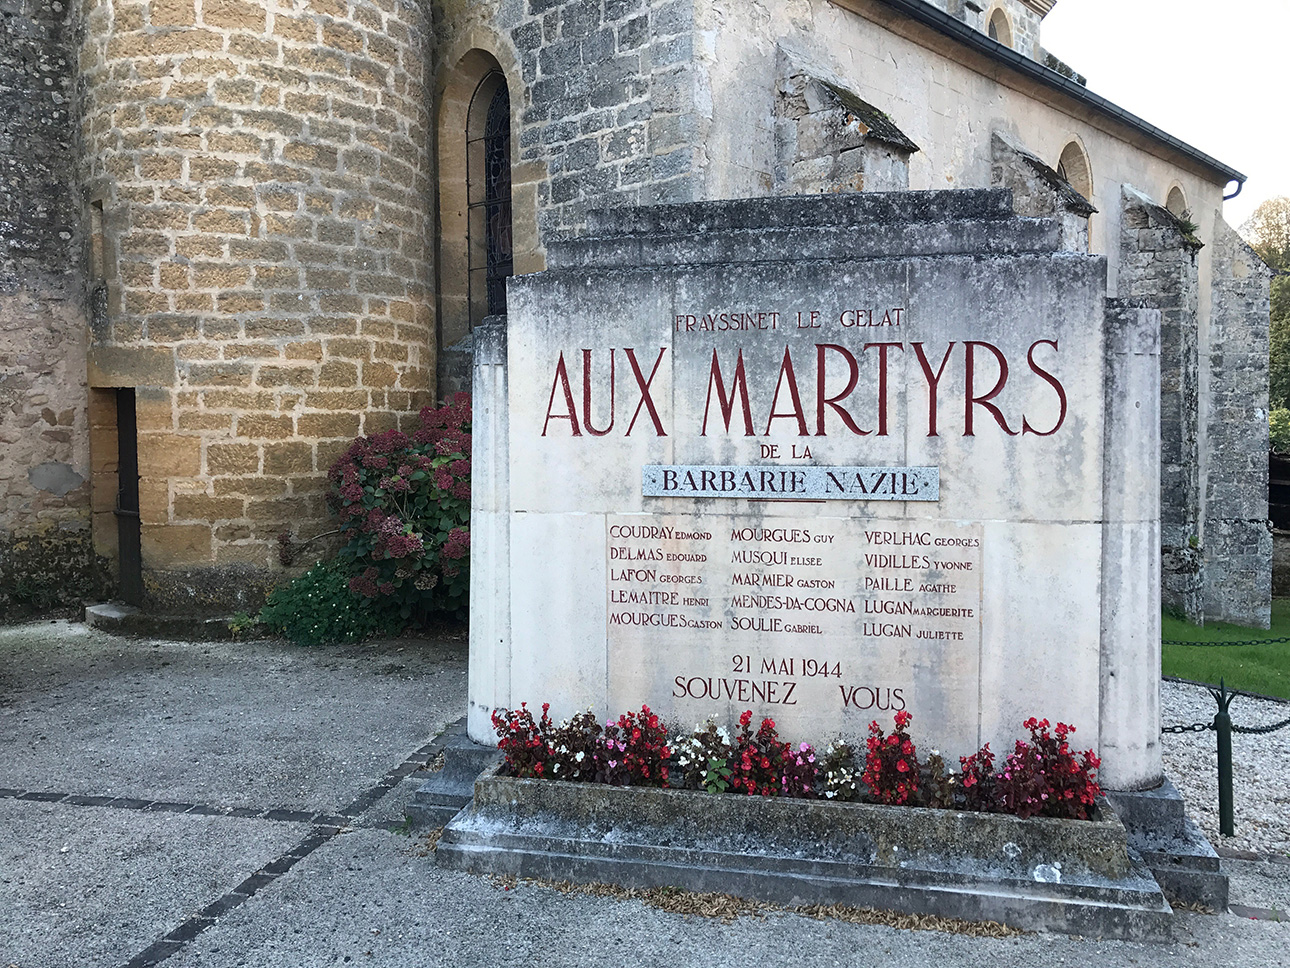 Aux Martyrs